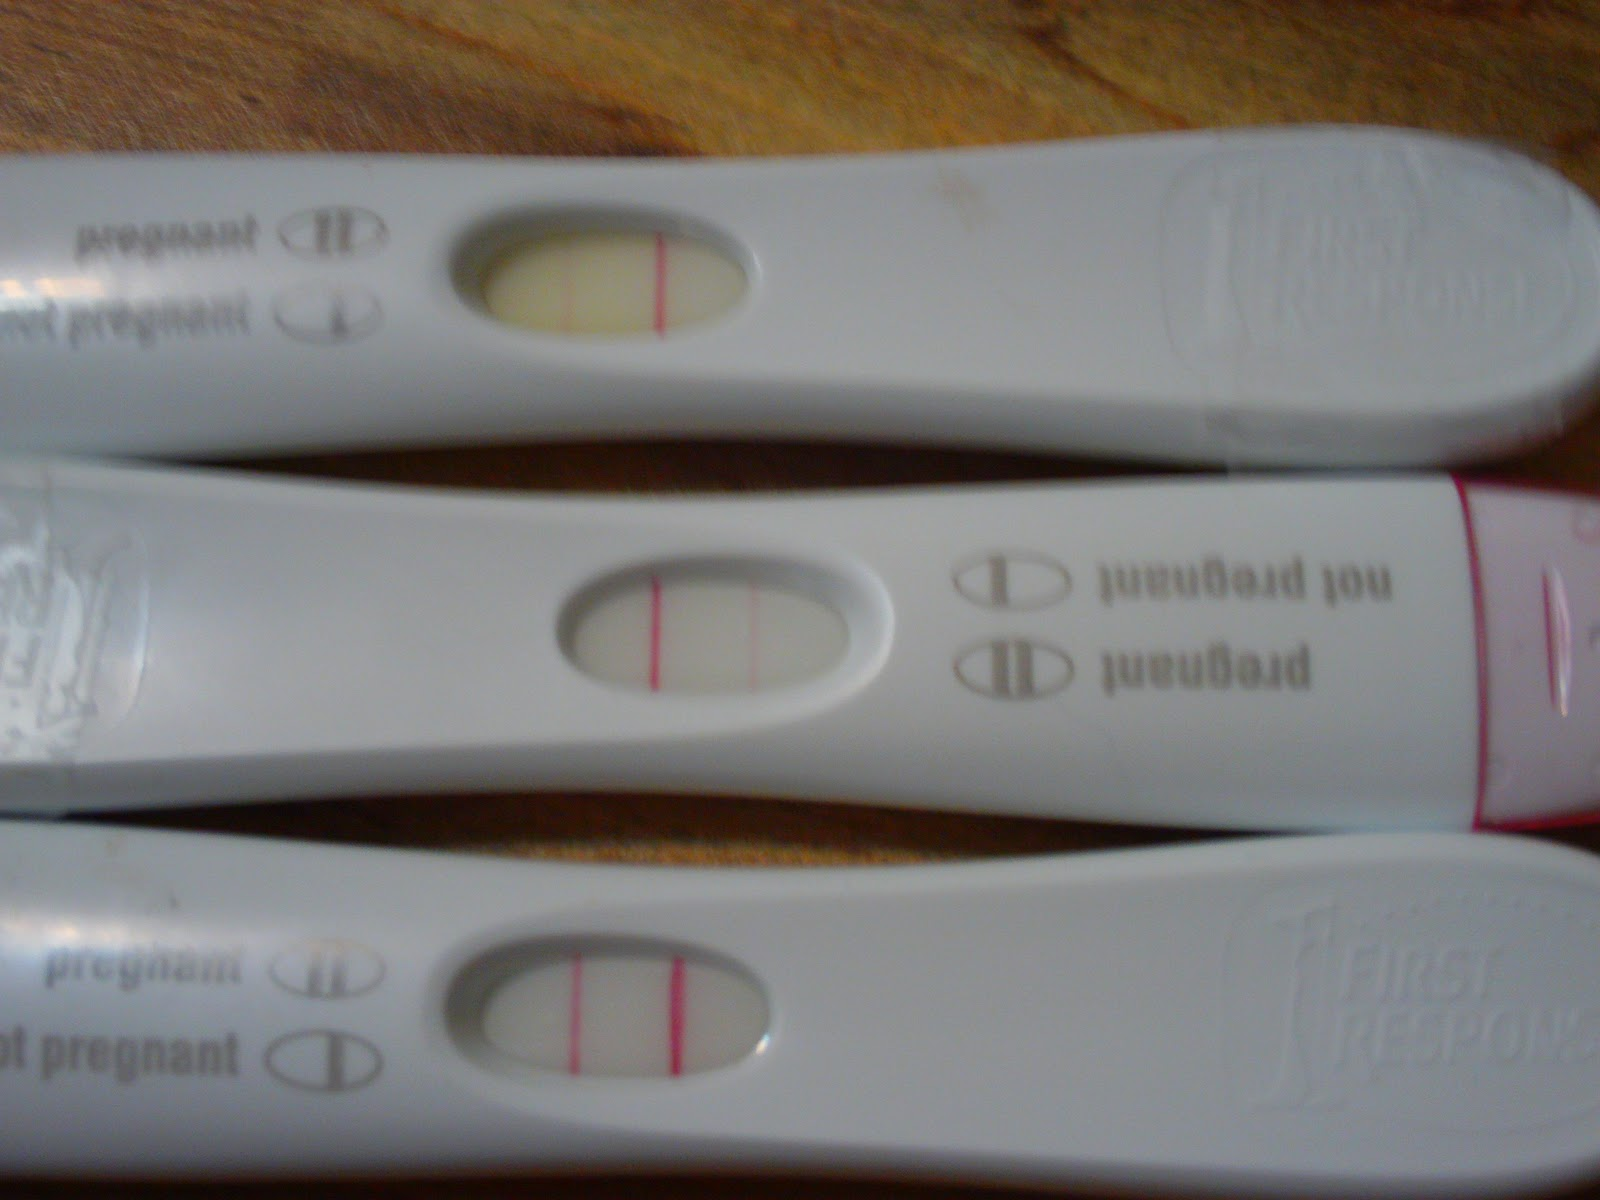 Equate Early Result Pregnancy Test Evap Line - pregnancy test